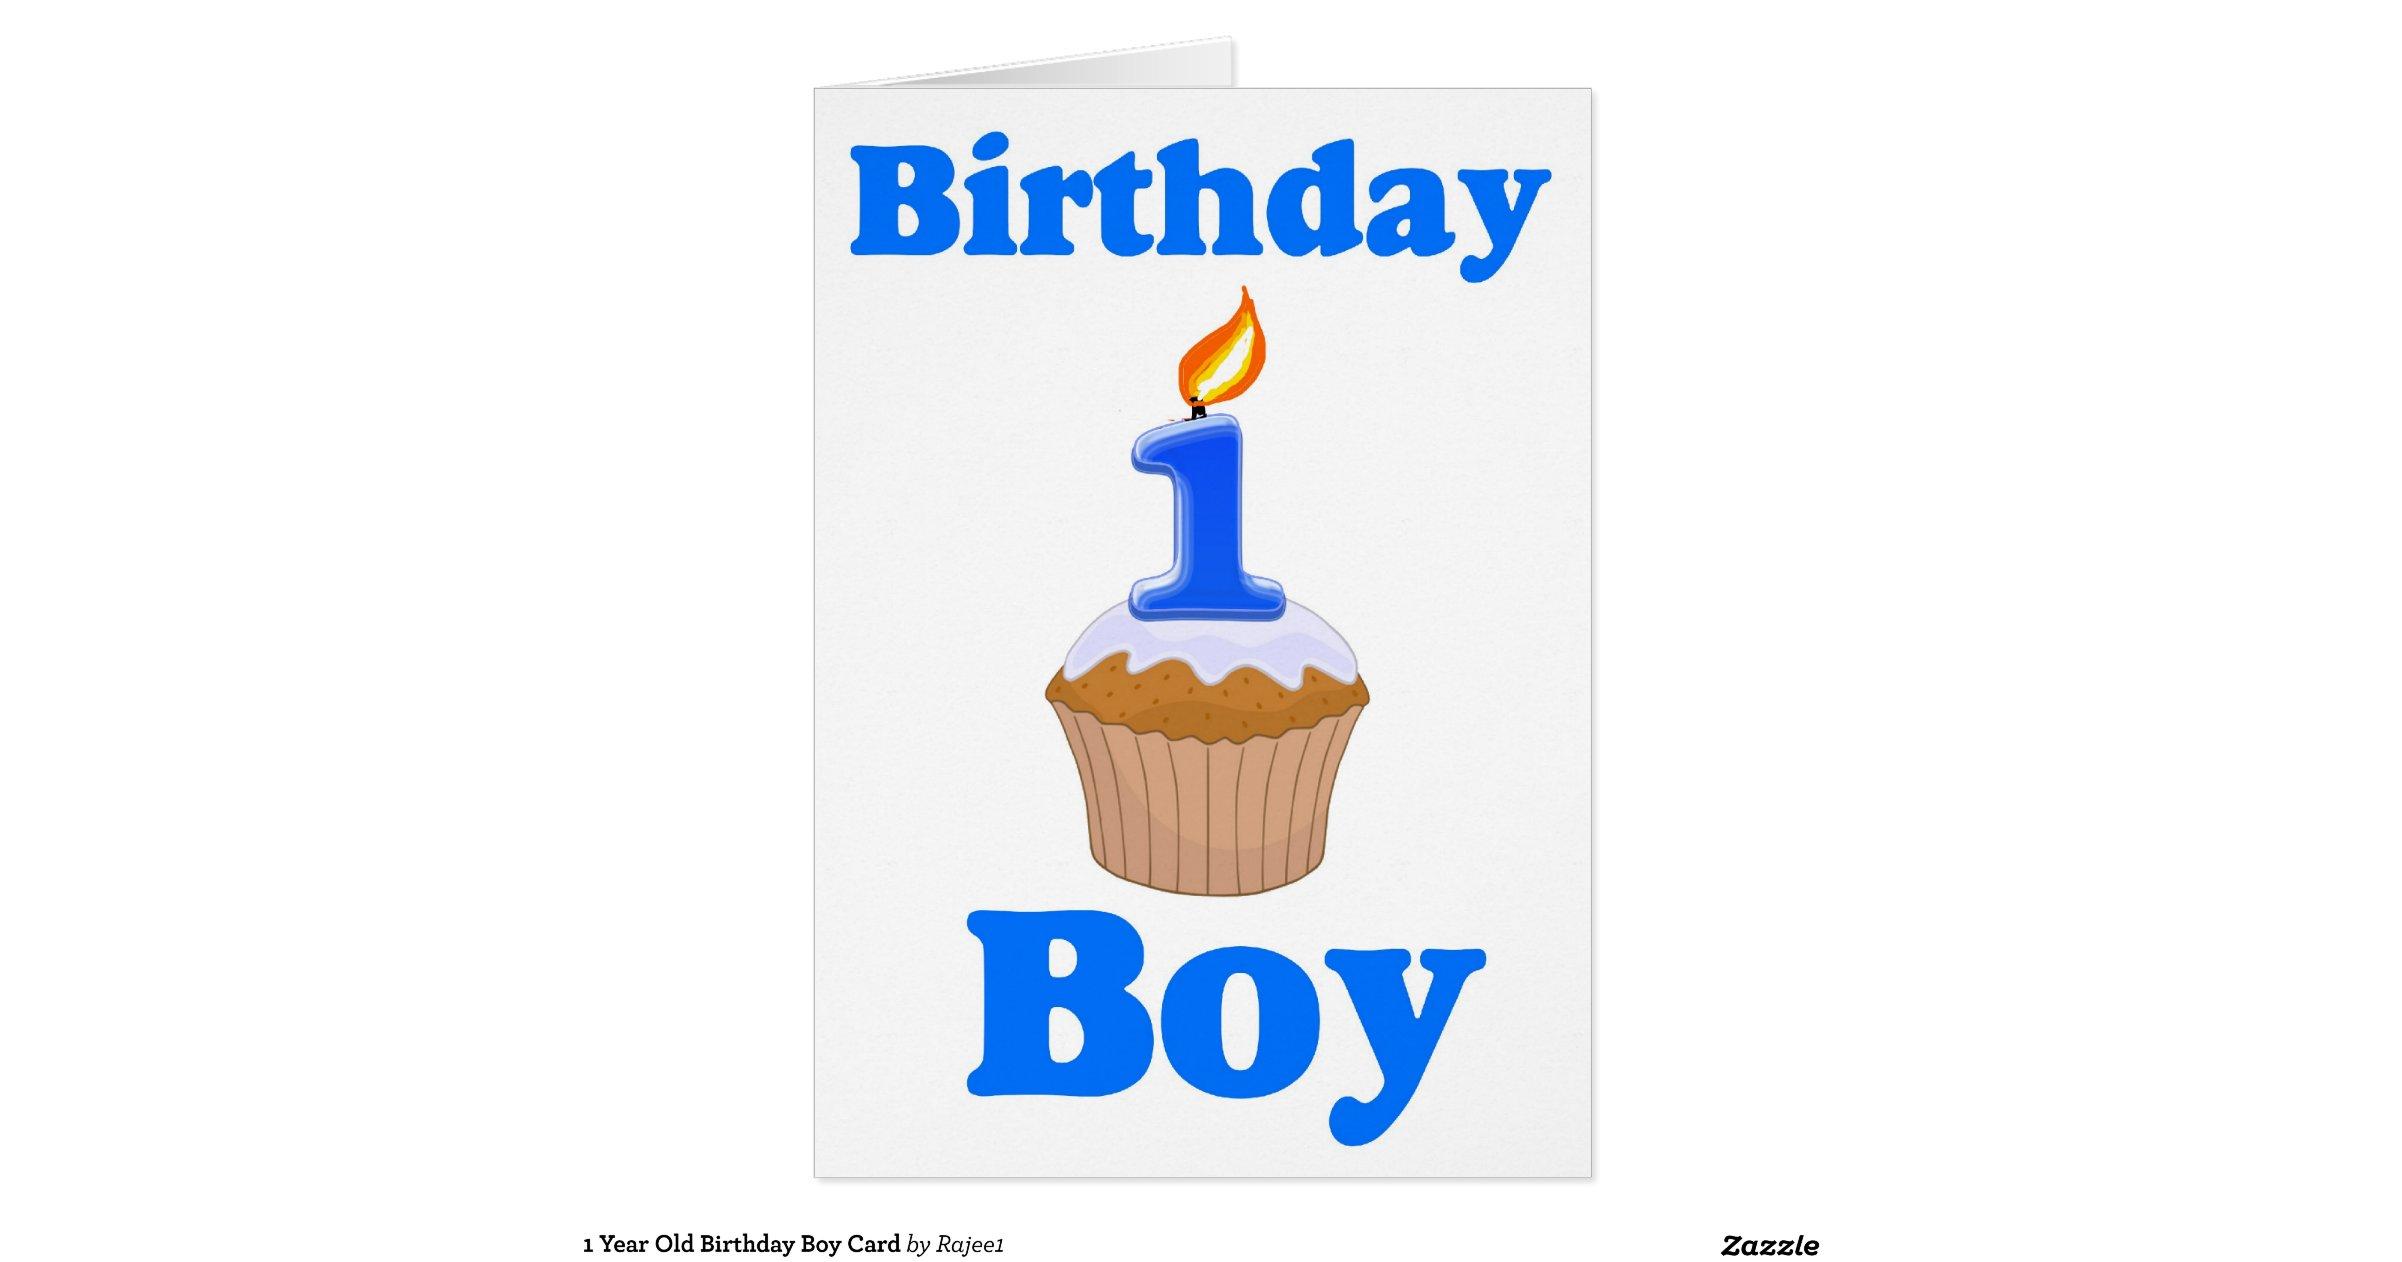 birthday cards zazzle - HD2468×1296